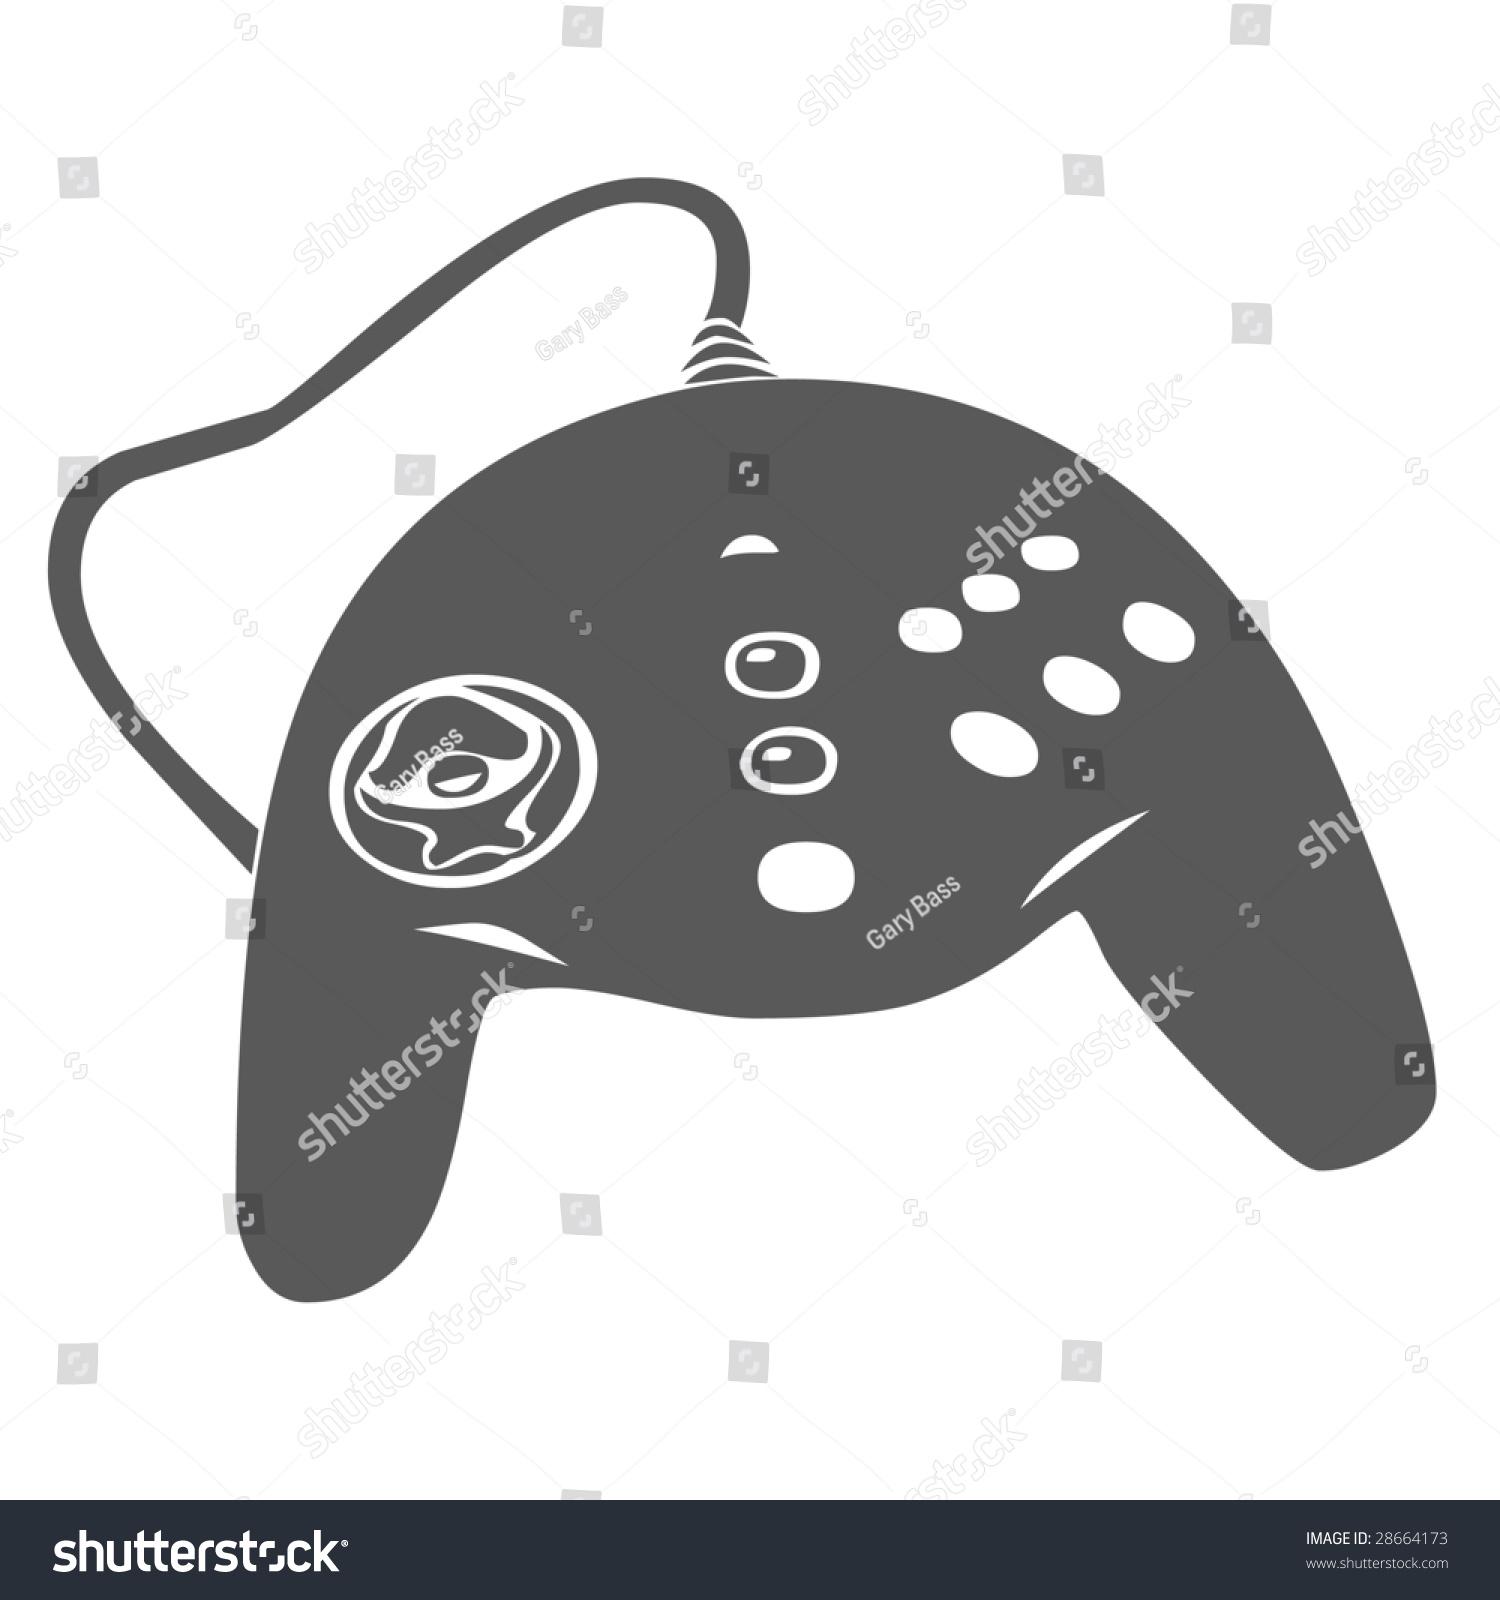 Game Controller Symbol Stock Illustration 28664173 Shutterstock